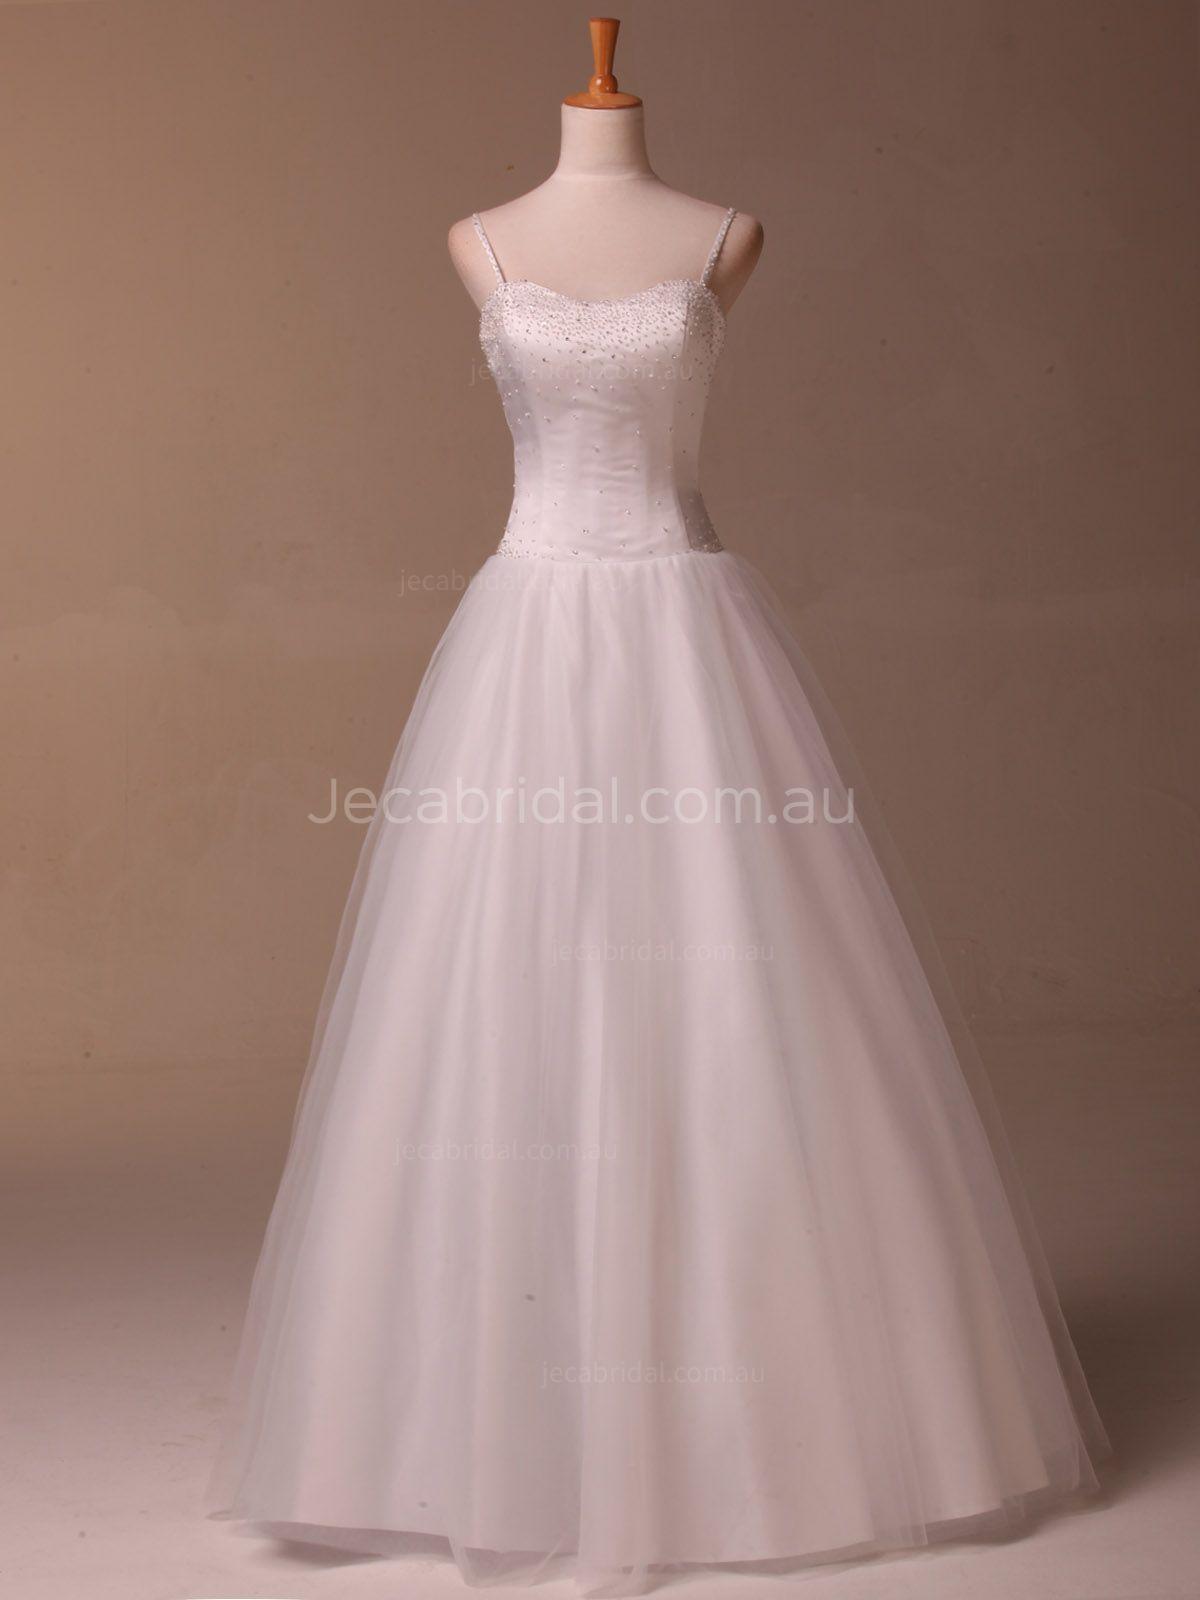 haley wedding dresses photo - 1